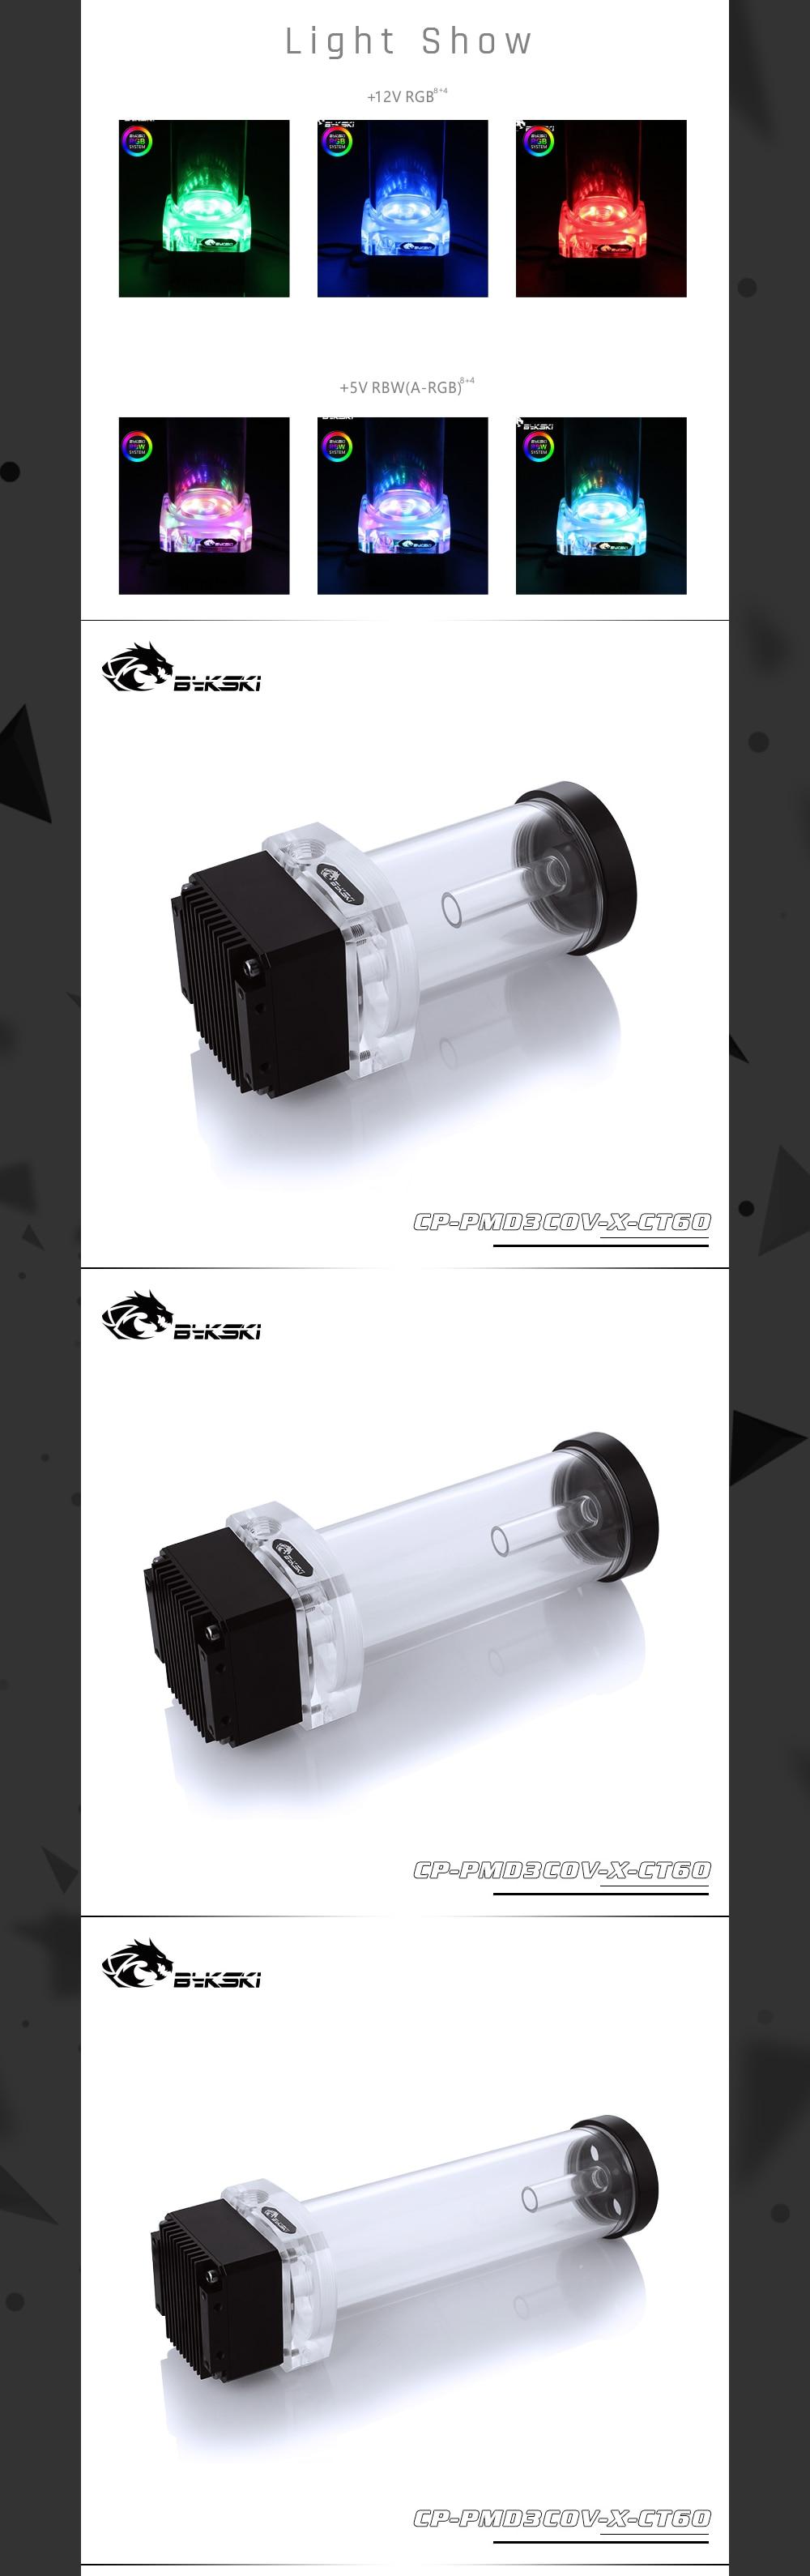 Bykski CP-PMD3COV-X-CT60 , Pump-reservoir Combination , Bykski DDC Pump With Lighting , Maximum Flow 600L/H Maximum Lift 6 Meter